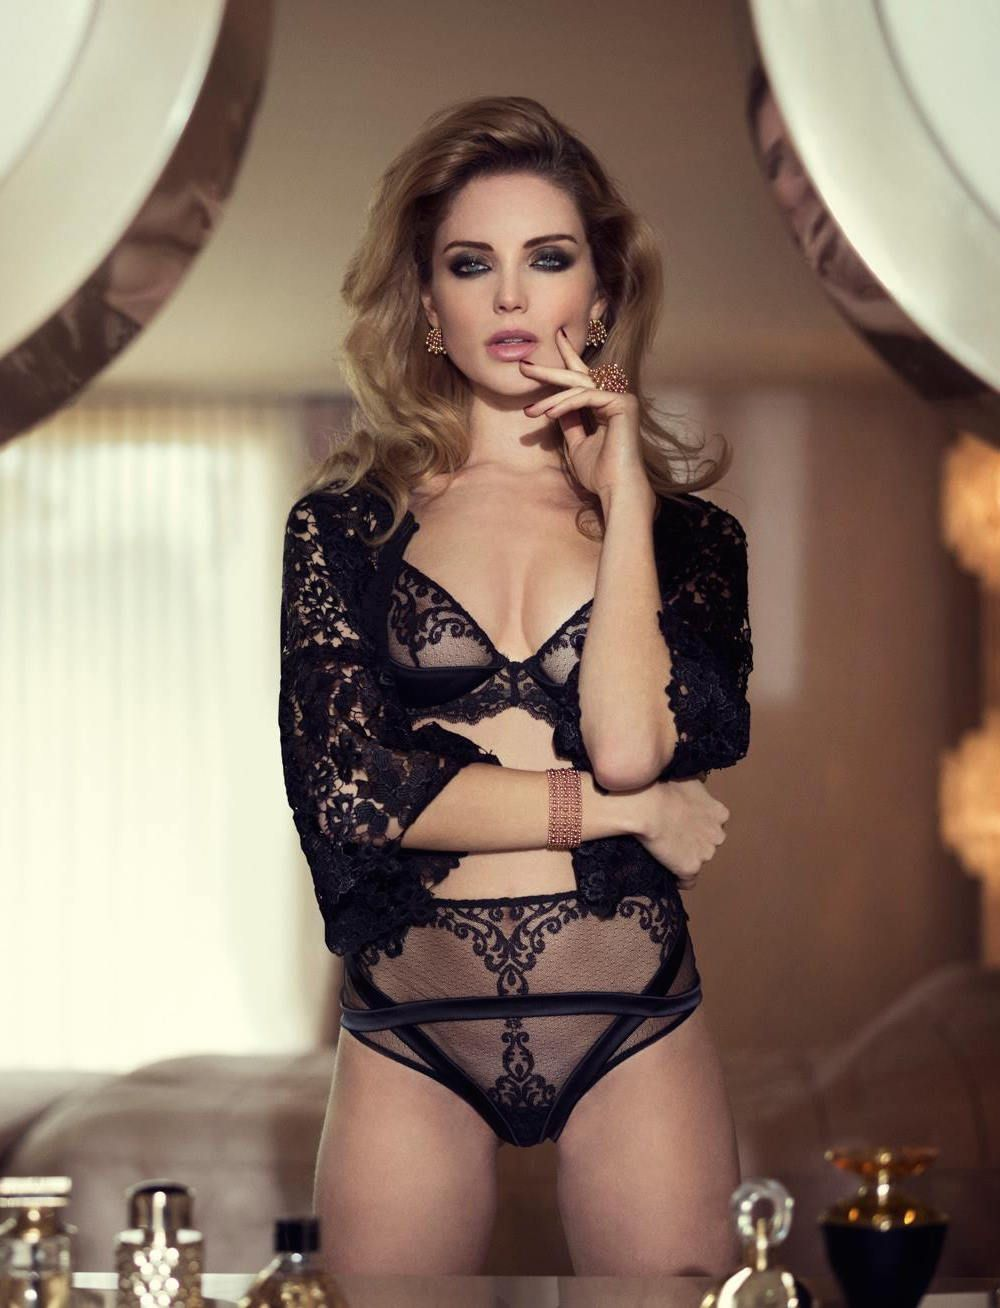 Mélissa Gateau Fashion Model Sexy Lingerie in La Perla Campaign 2015  Photoshoots 638175eb3